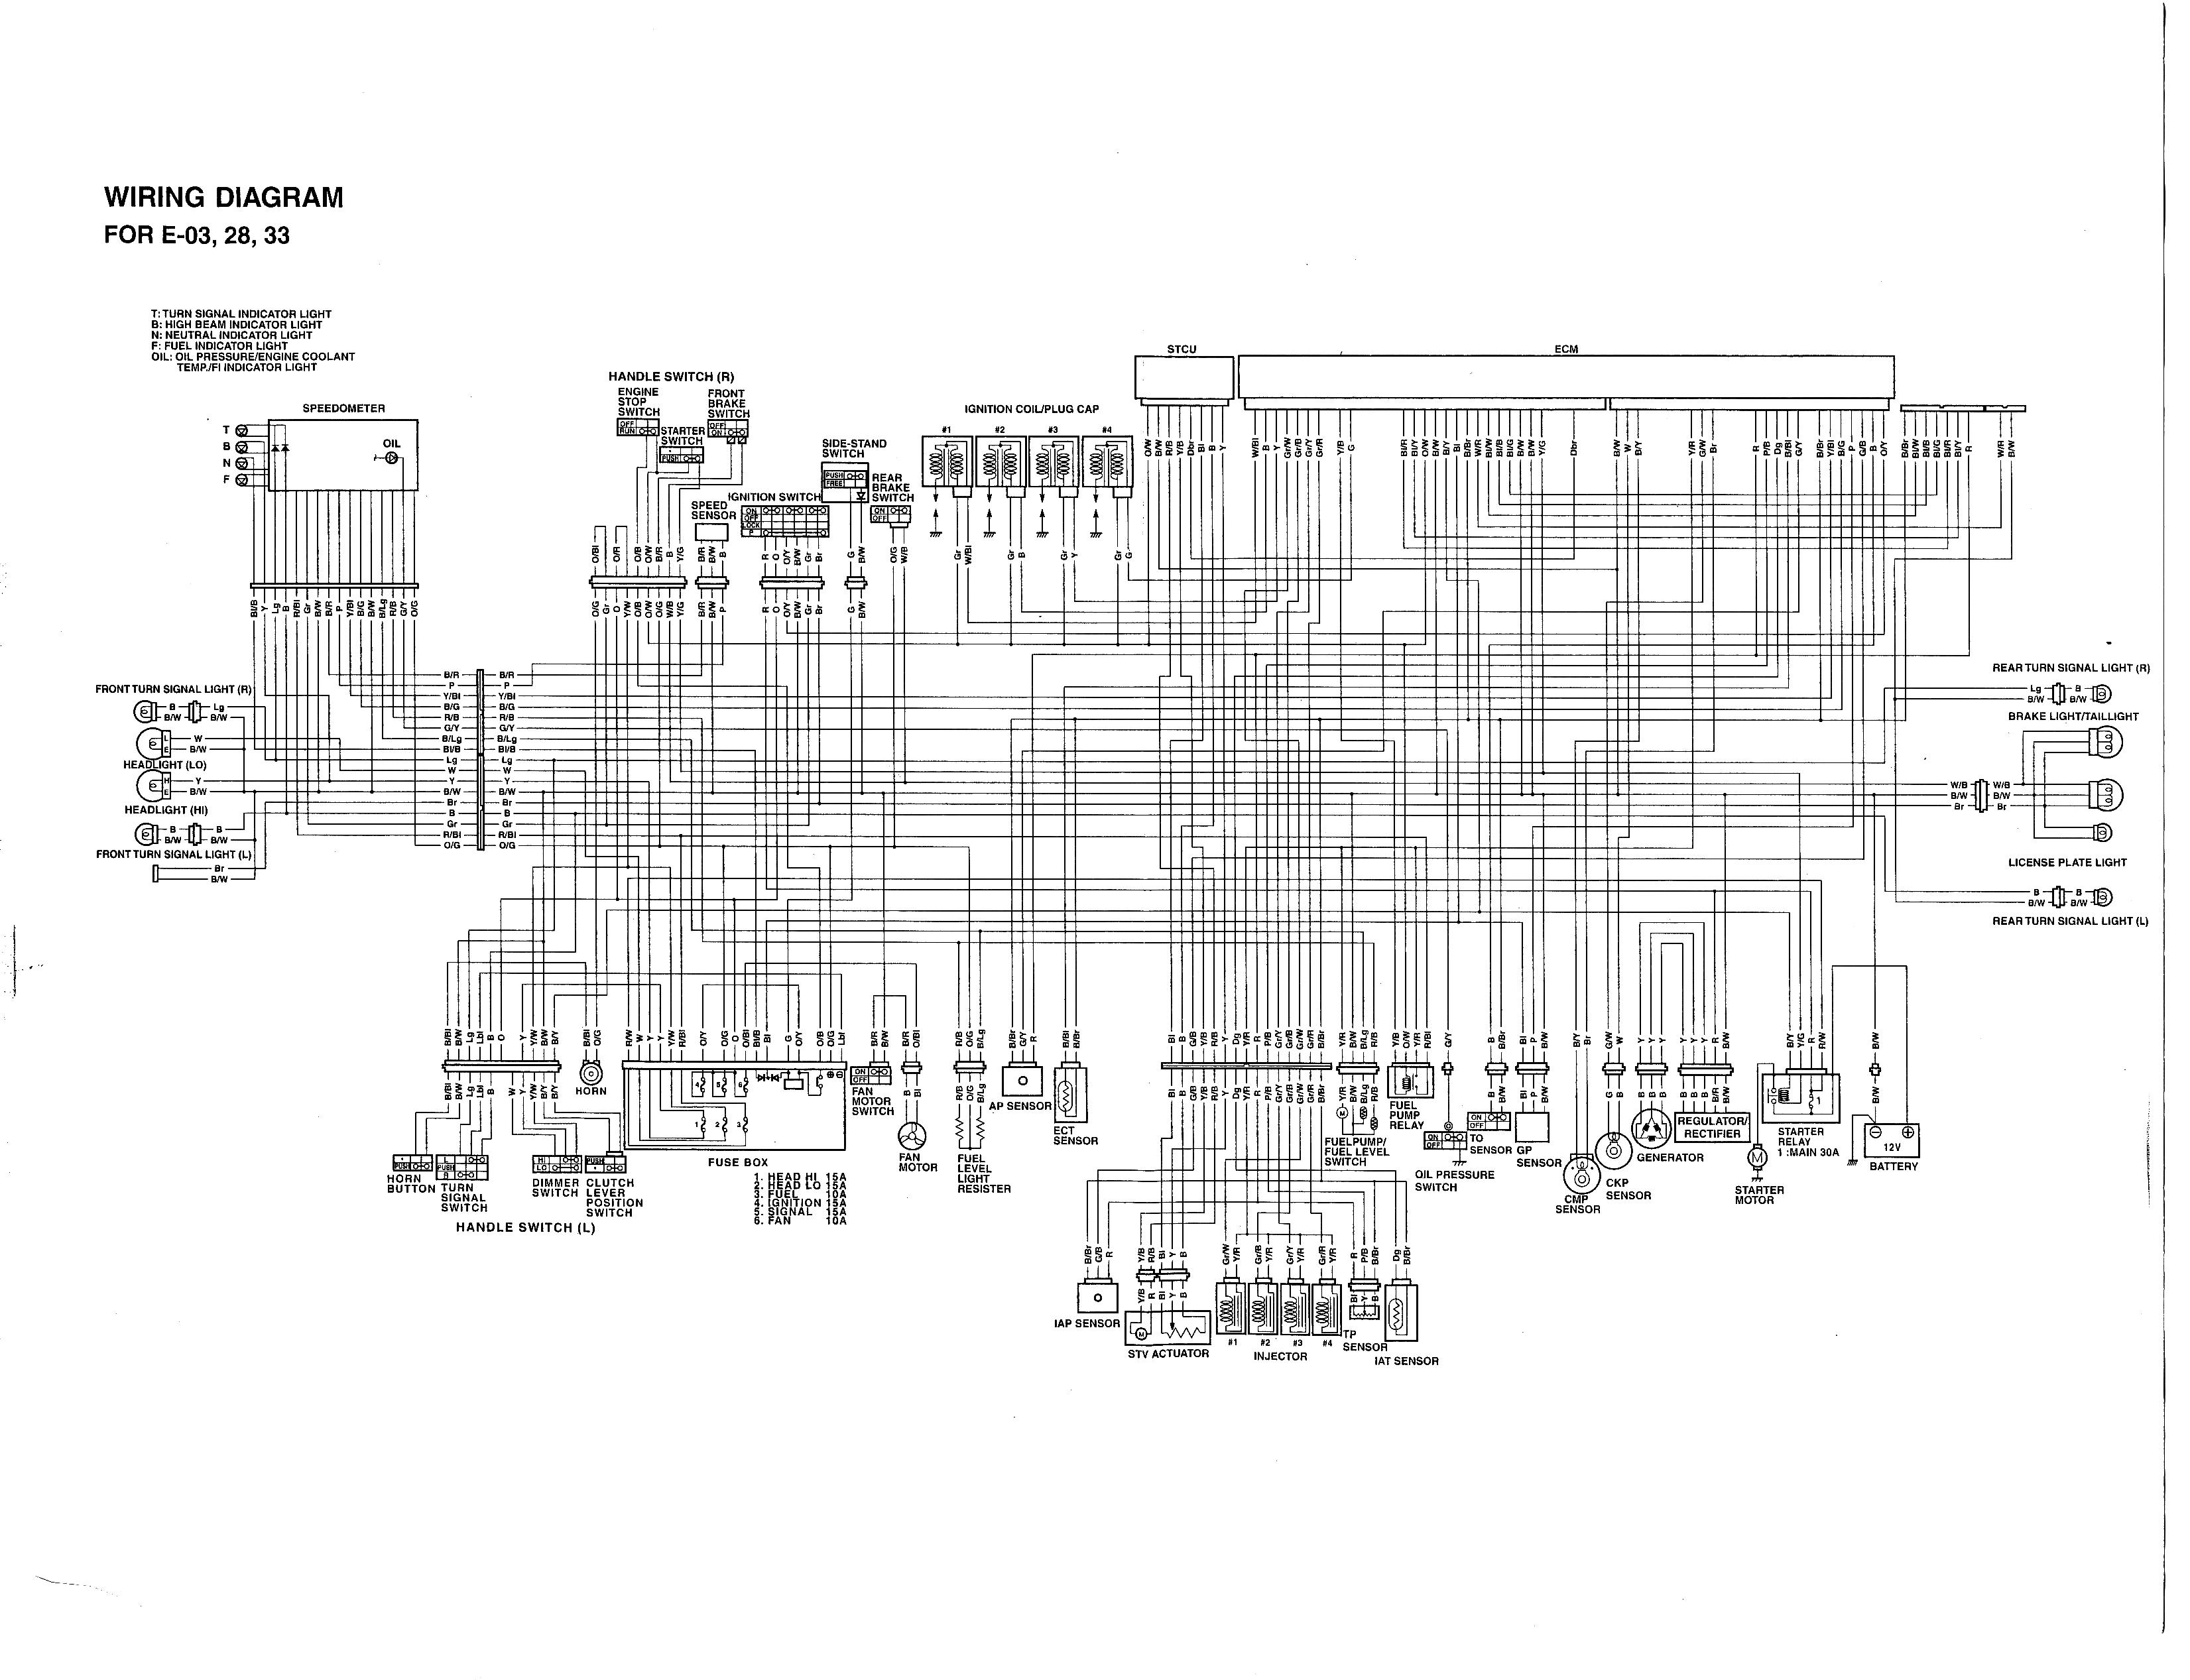 wiring diagram for 2007 gsxr 600 powerking co rh powerking co 2007 gsxr 600 wiring diagram pdf 2007 gsxr 750 wiring diagram